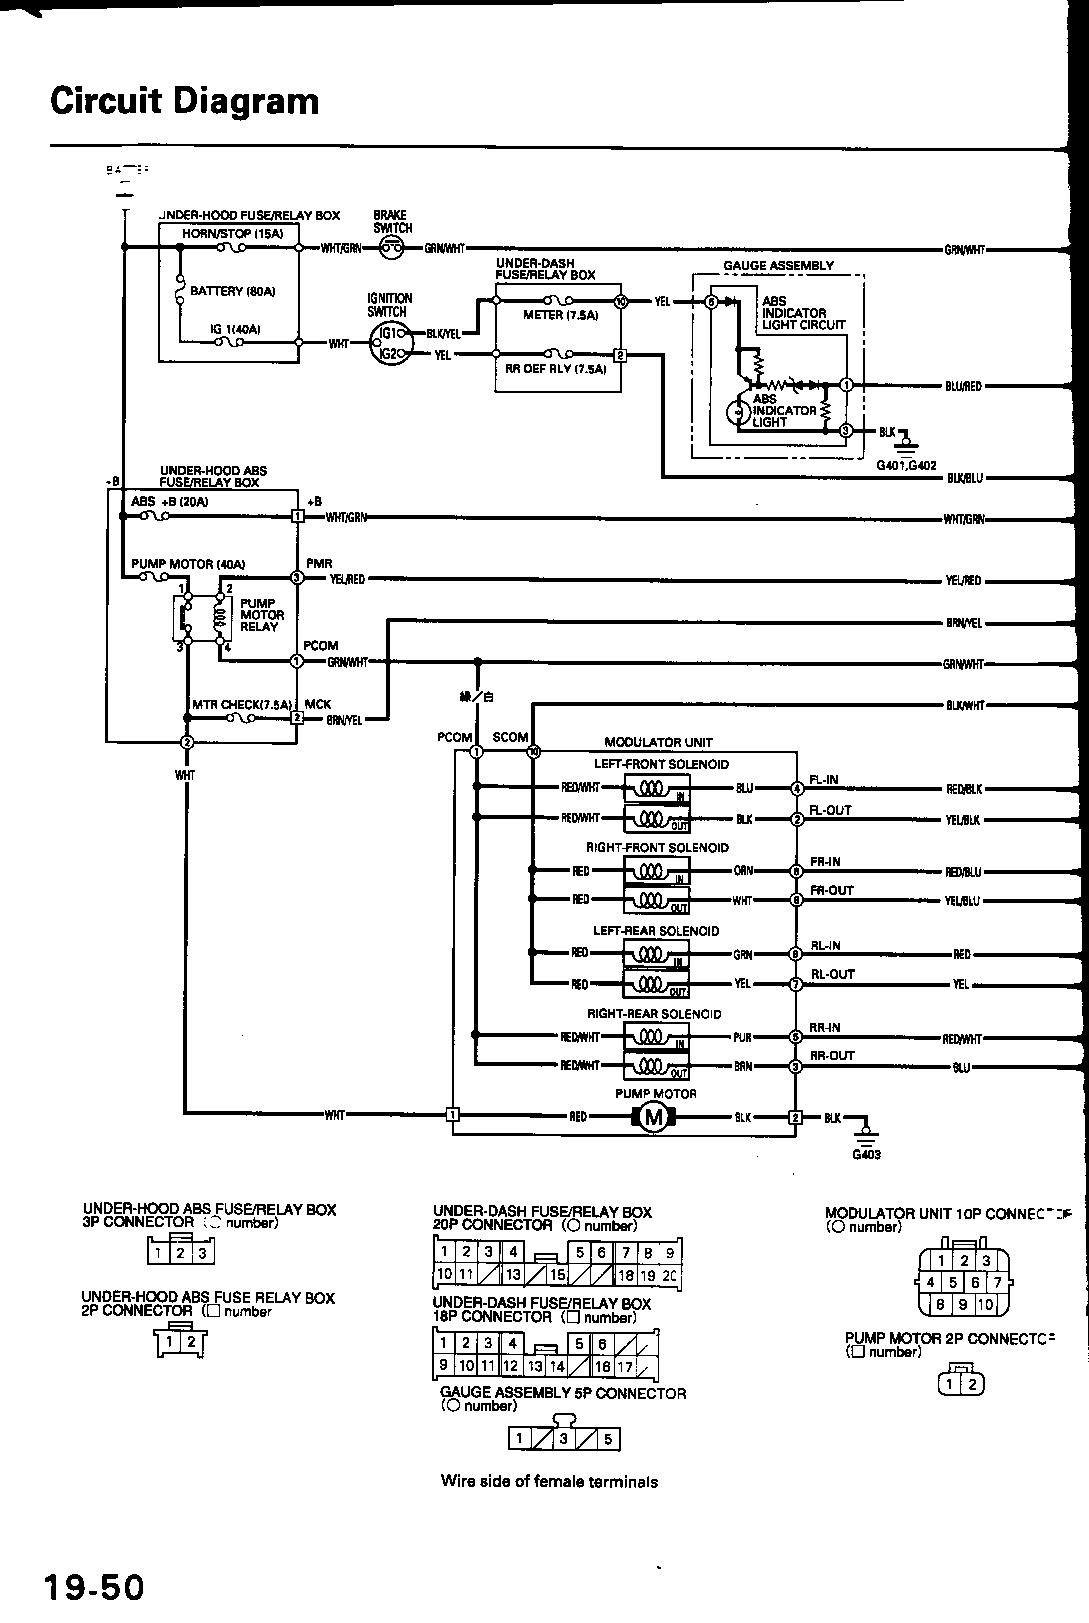 hight resolution of 1991 honda civic fuse box diagram 2000 honda civic fuse box 2000 honda civic fuse diagram